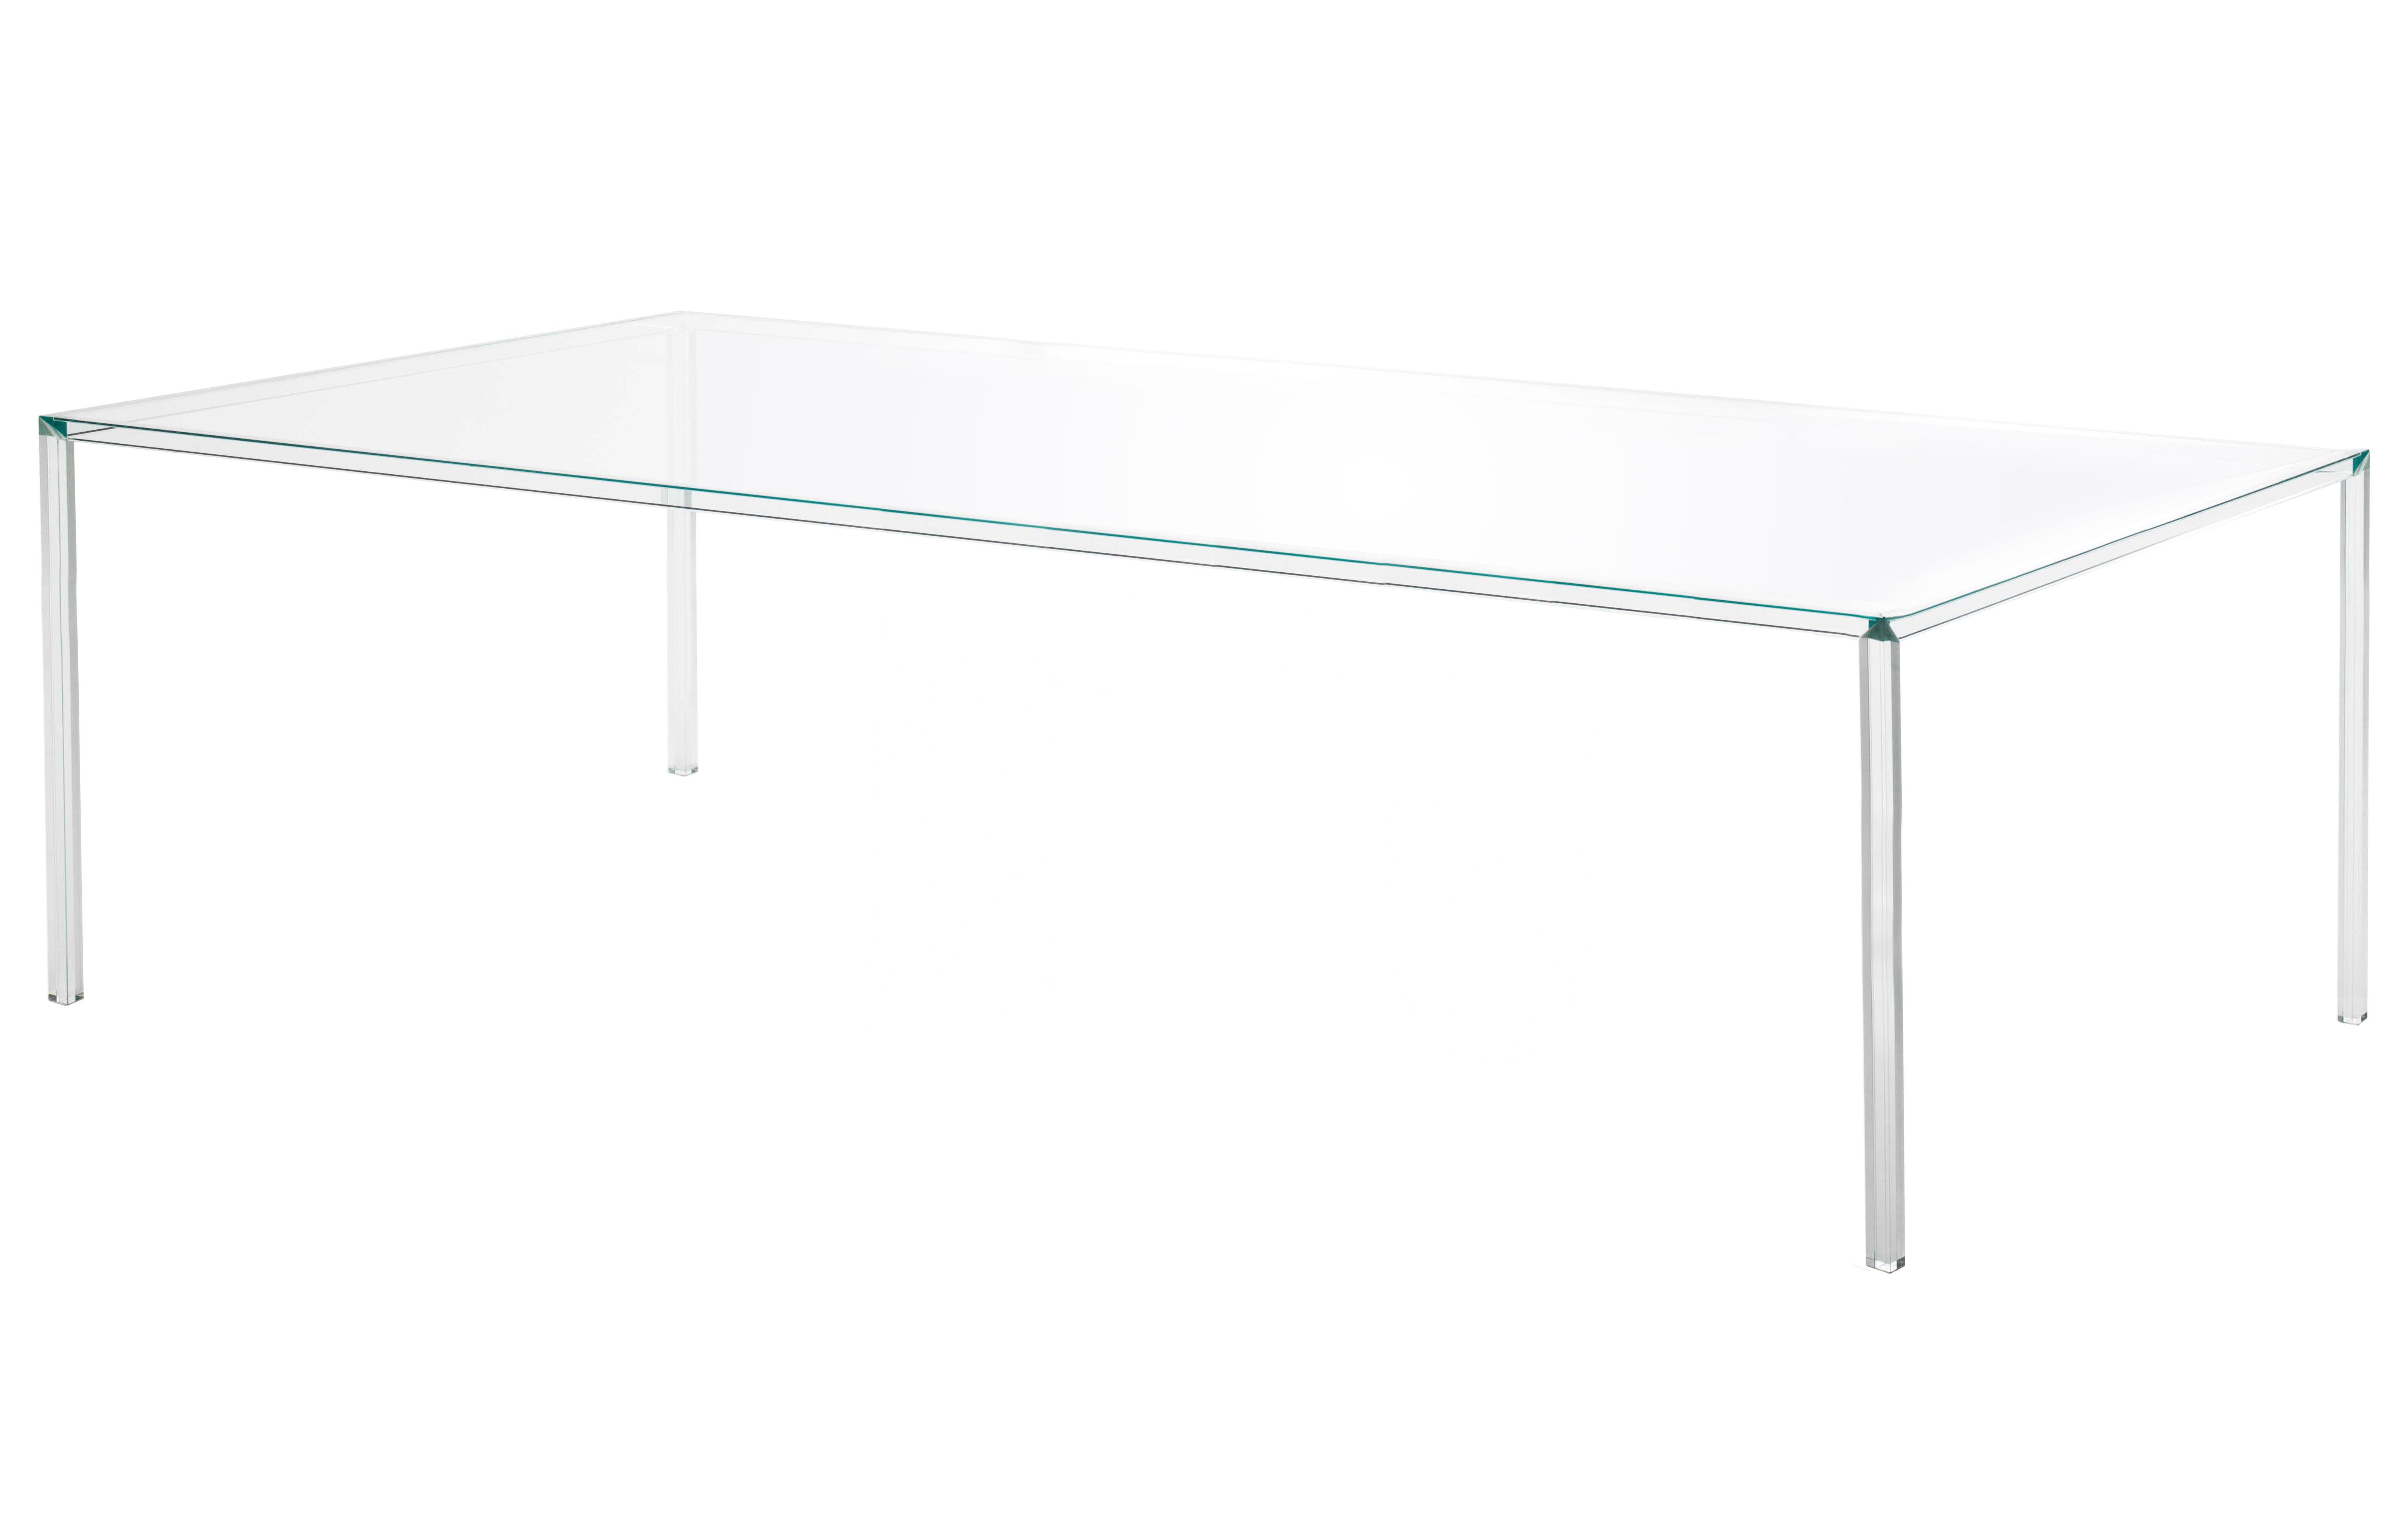 Furniture - Dining Tables - Luminous Rectangular table - 220 x 90 cm by Glas Italia - Transparent cristal - Glass